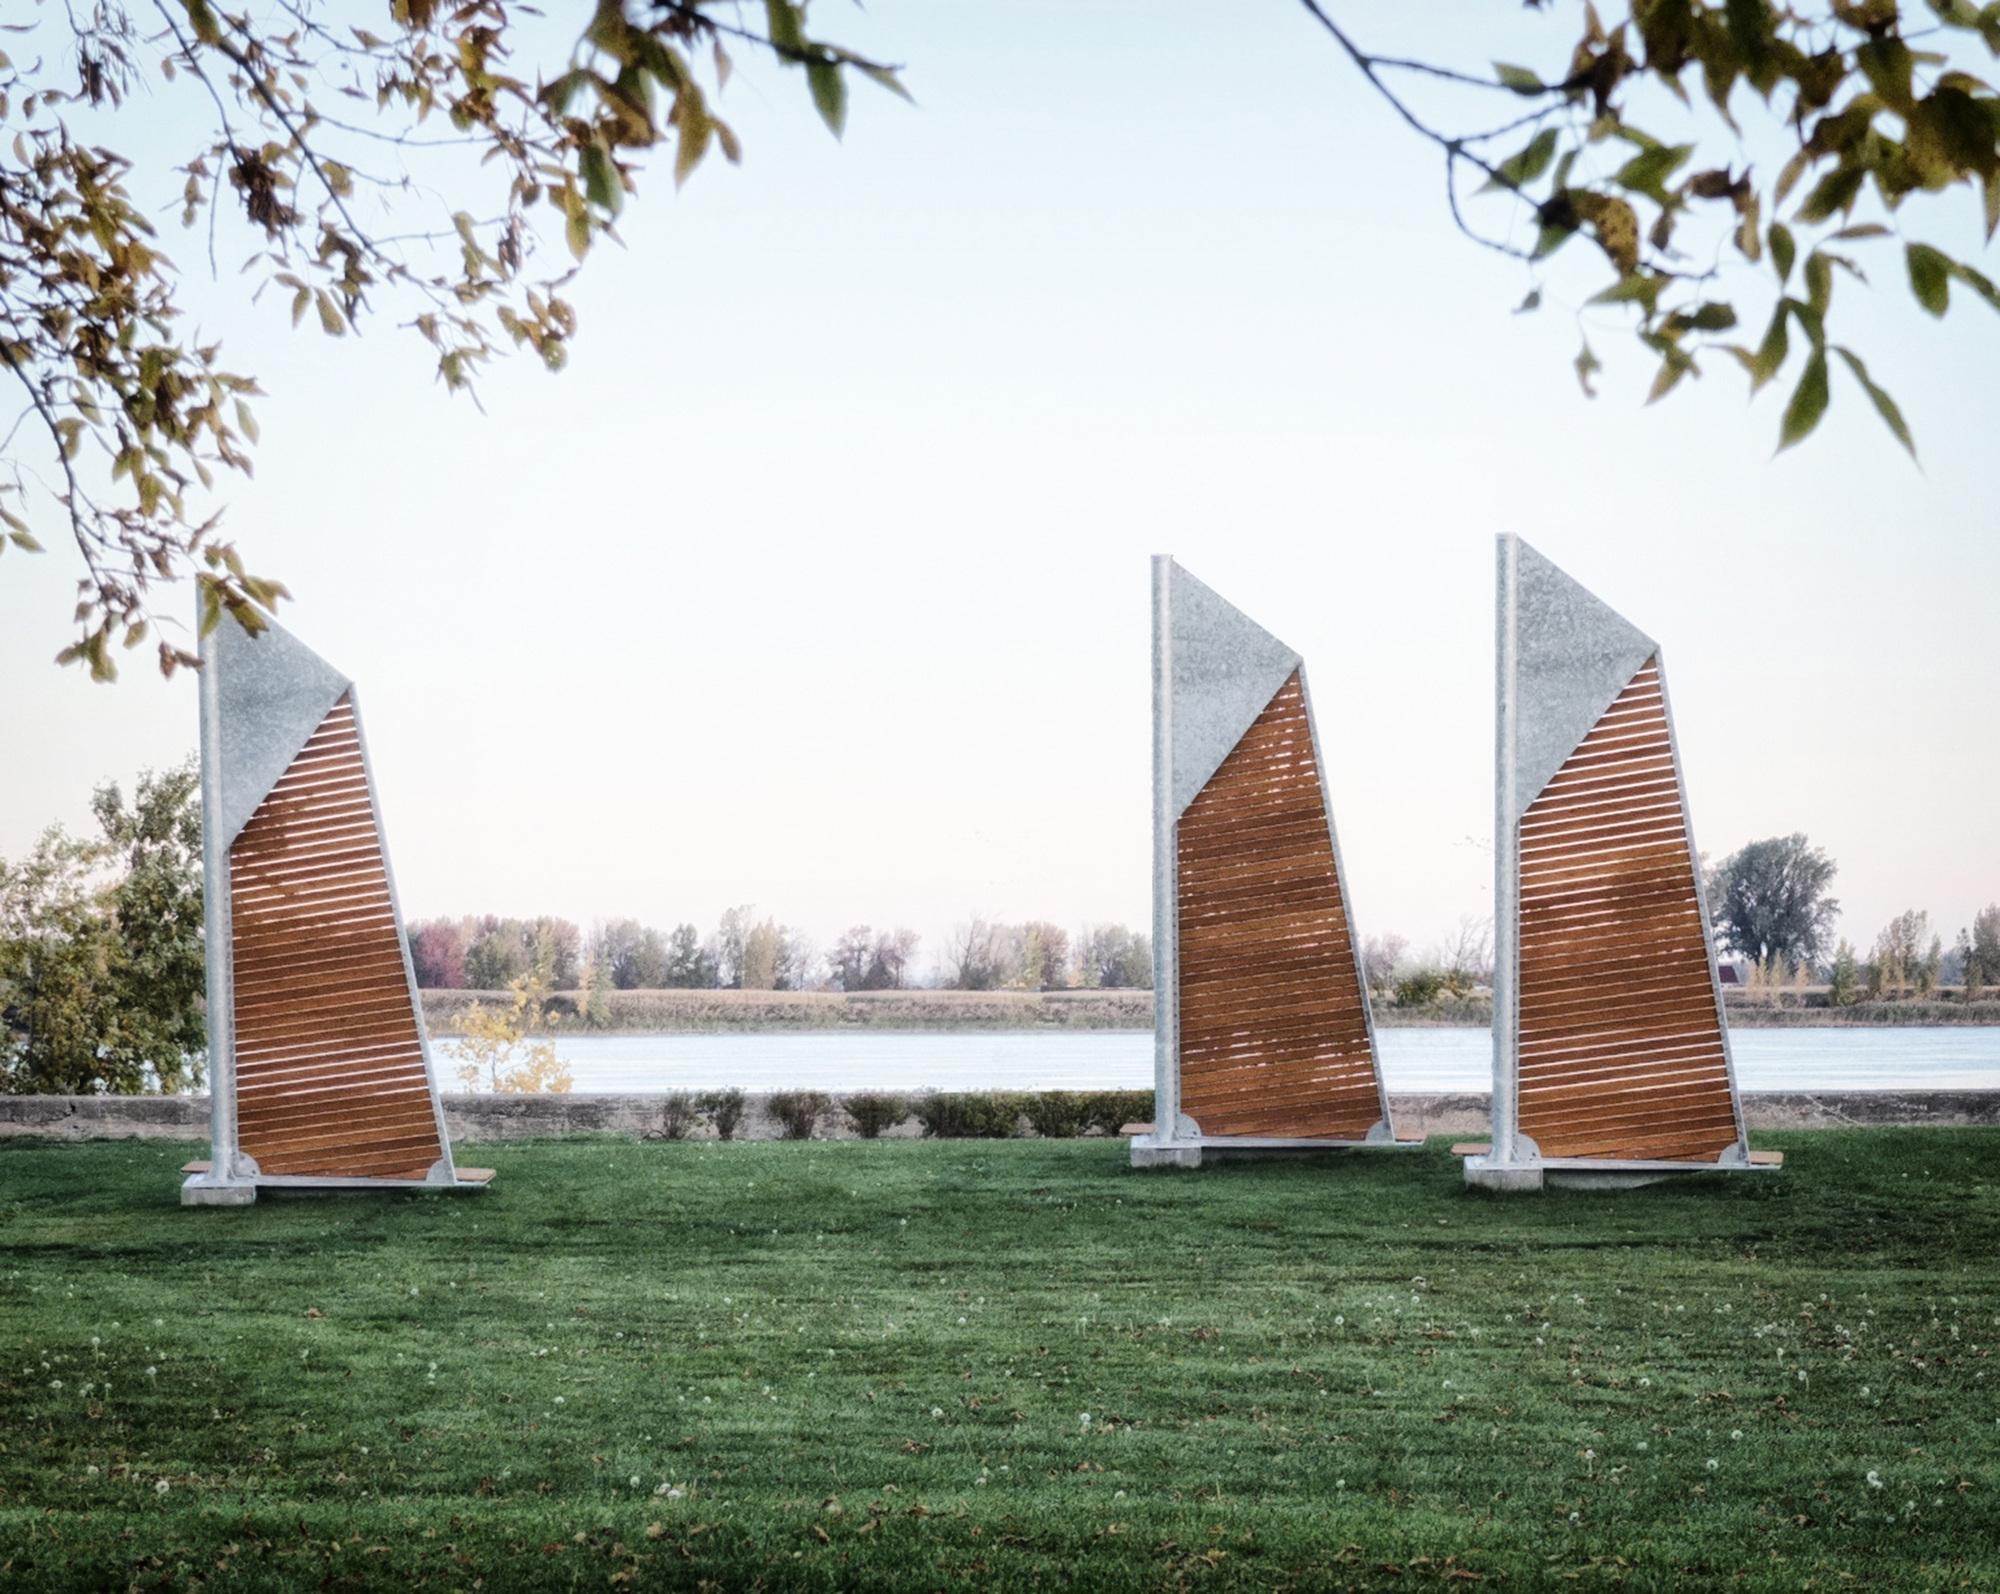 mobiliario jardim jumbo:Sails Park Benches